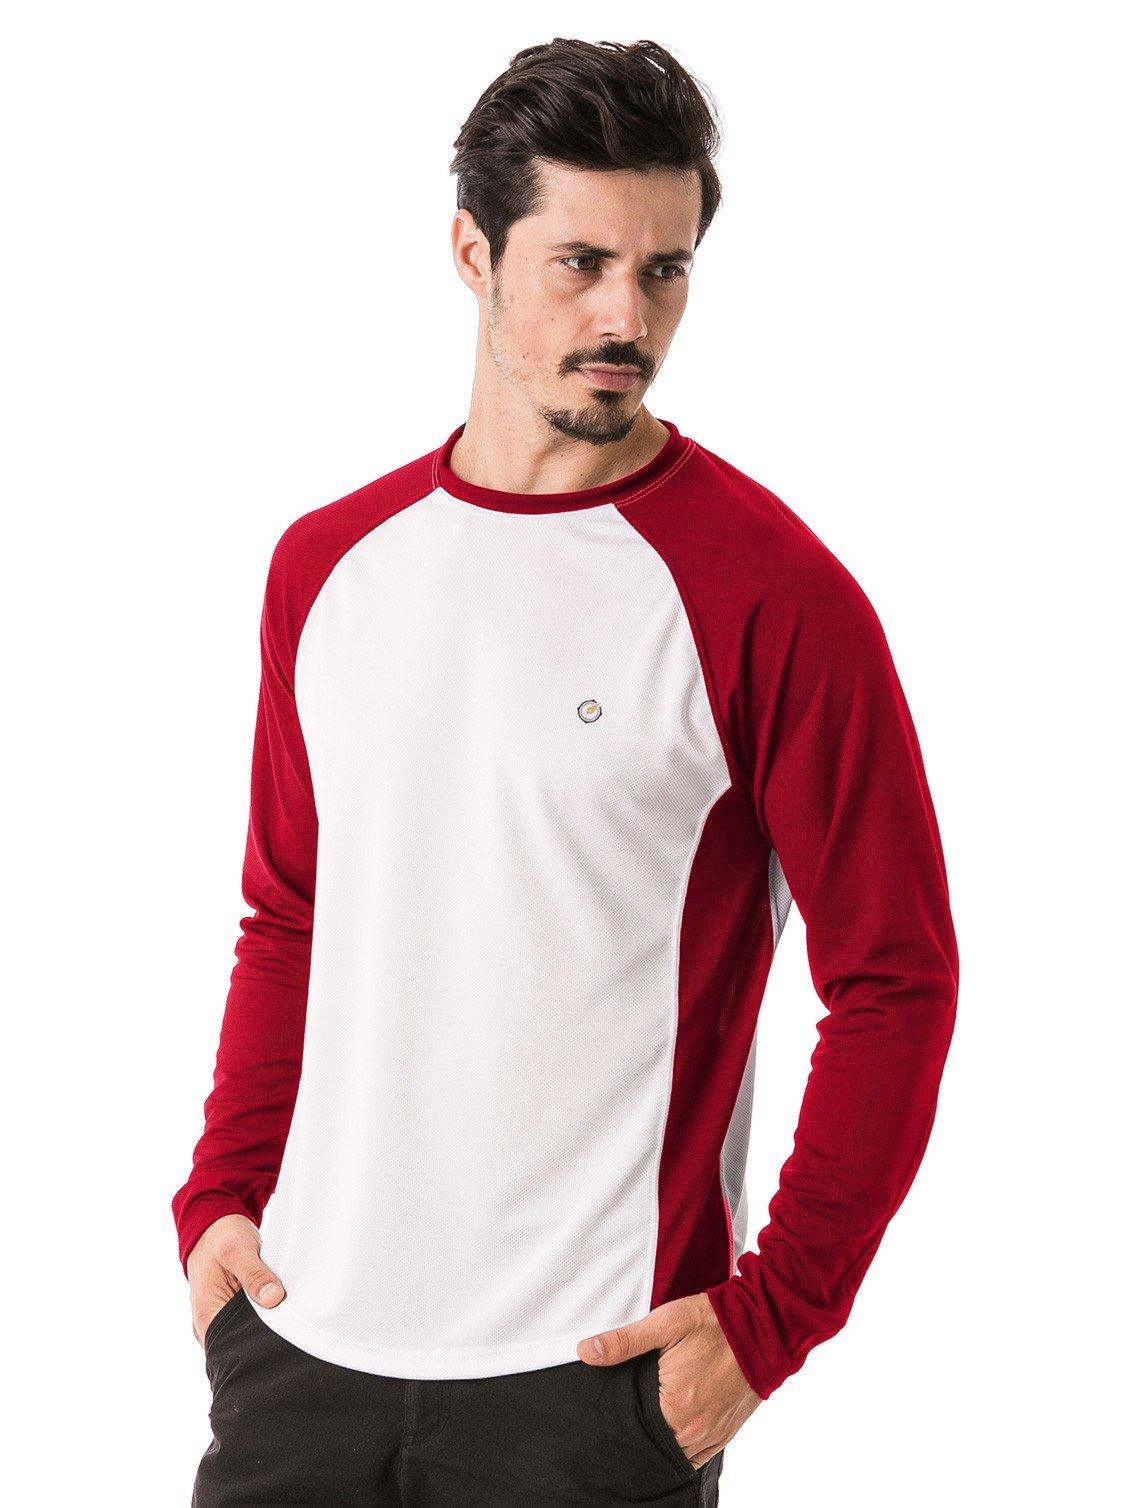 camisa masculina raglan gola redonda longa dry manga vermelha frente b